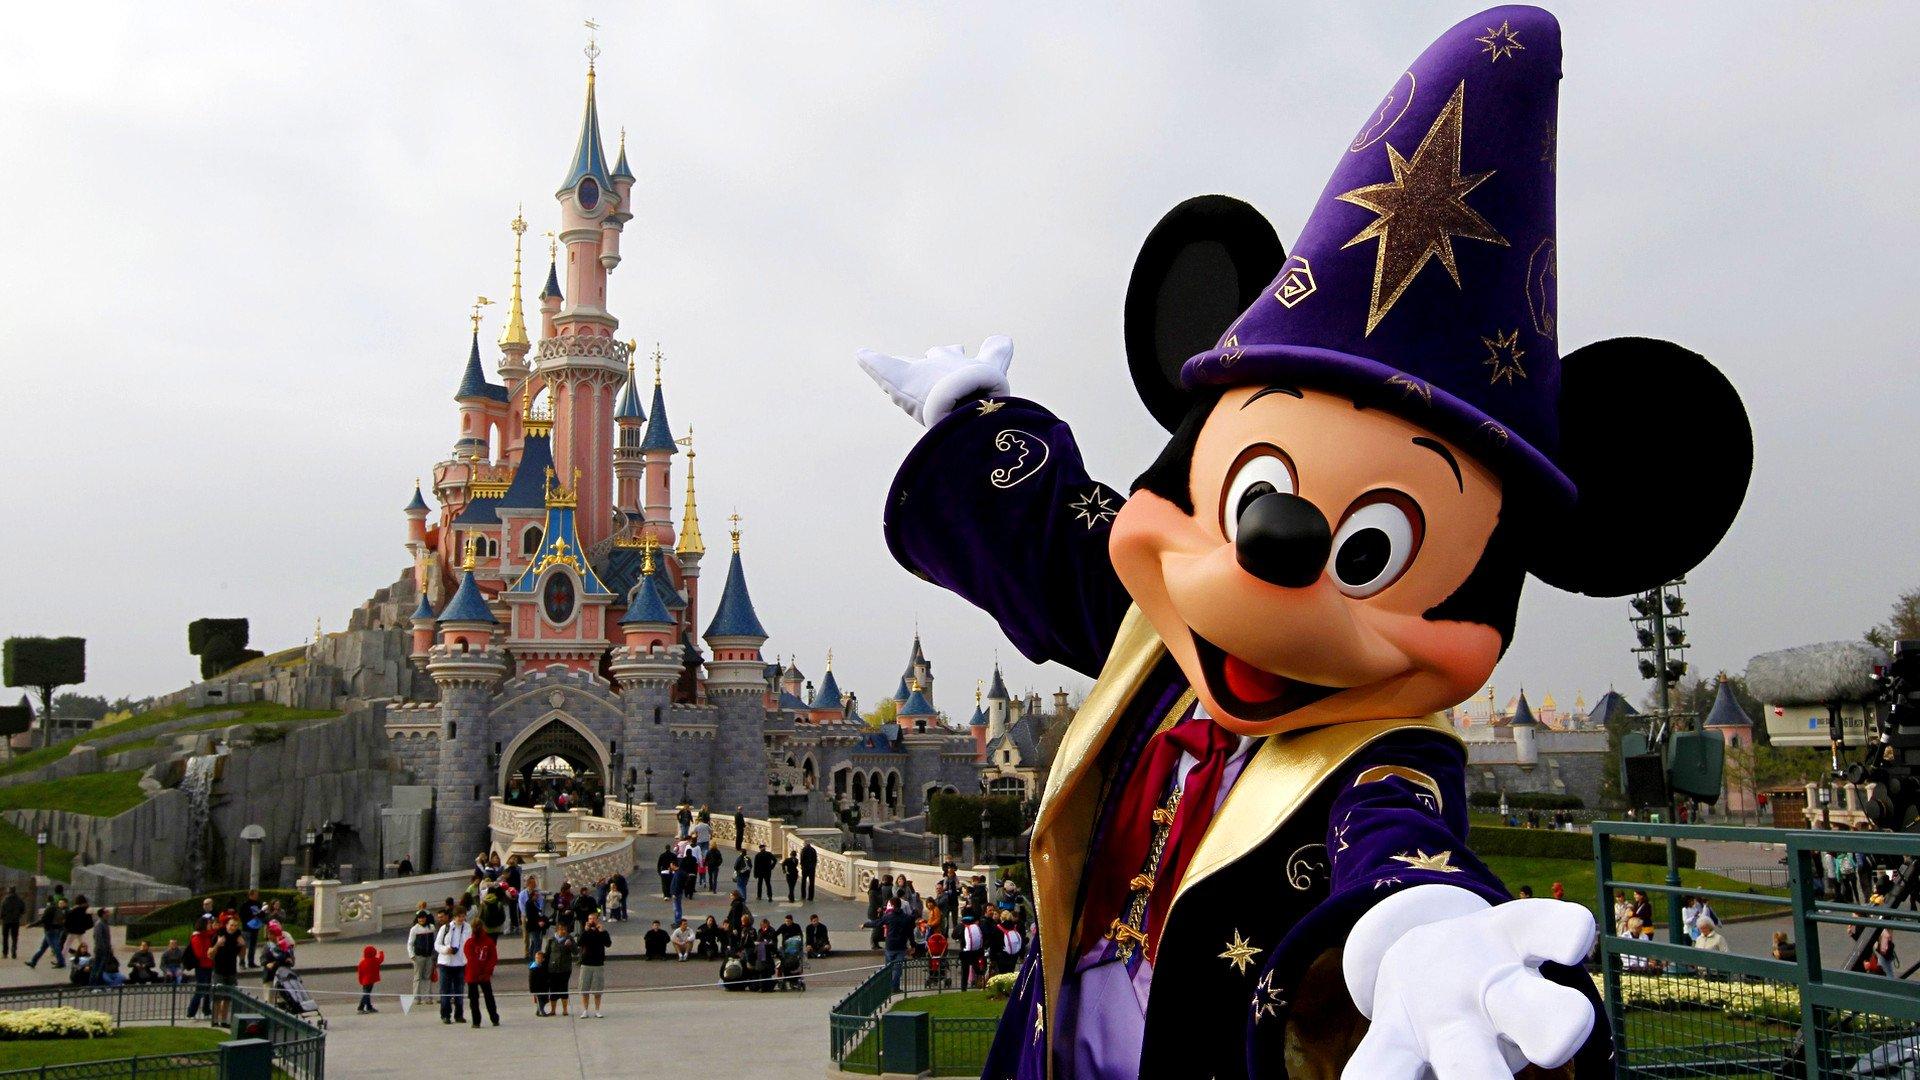 DISNEYLAND PARIS PER DISABILI   Vacanza accessibile Disneyland